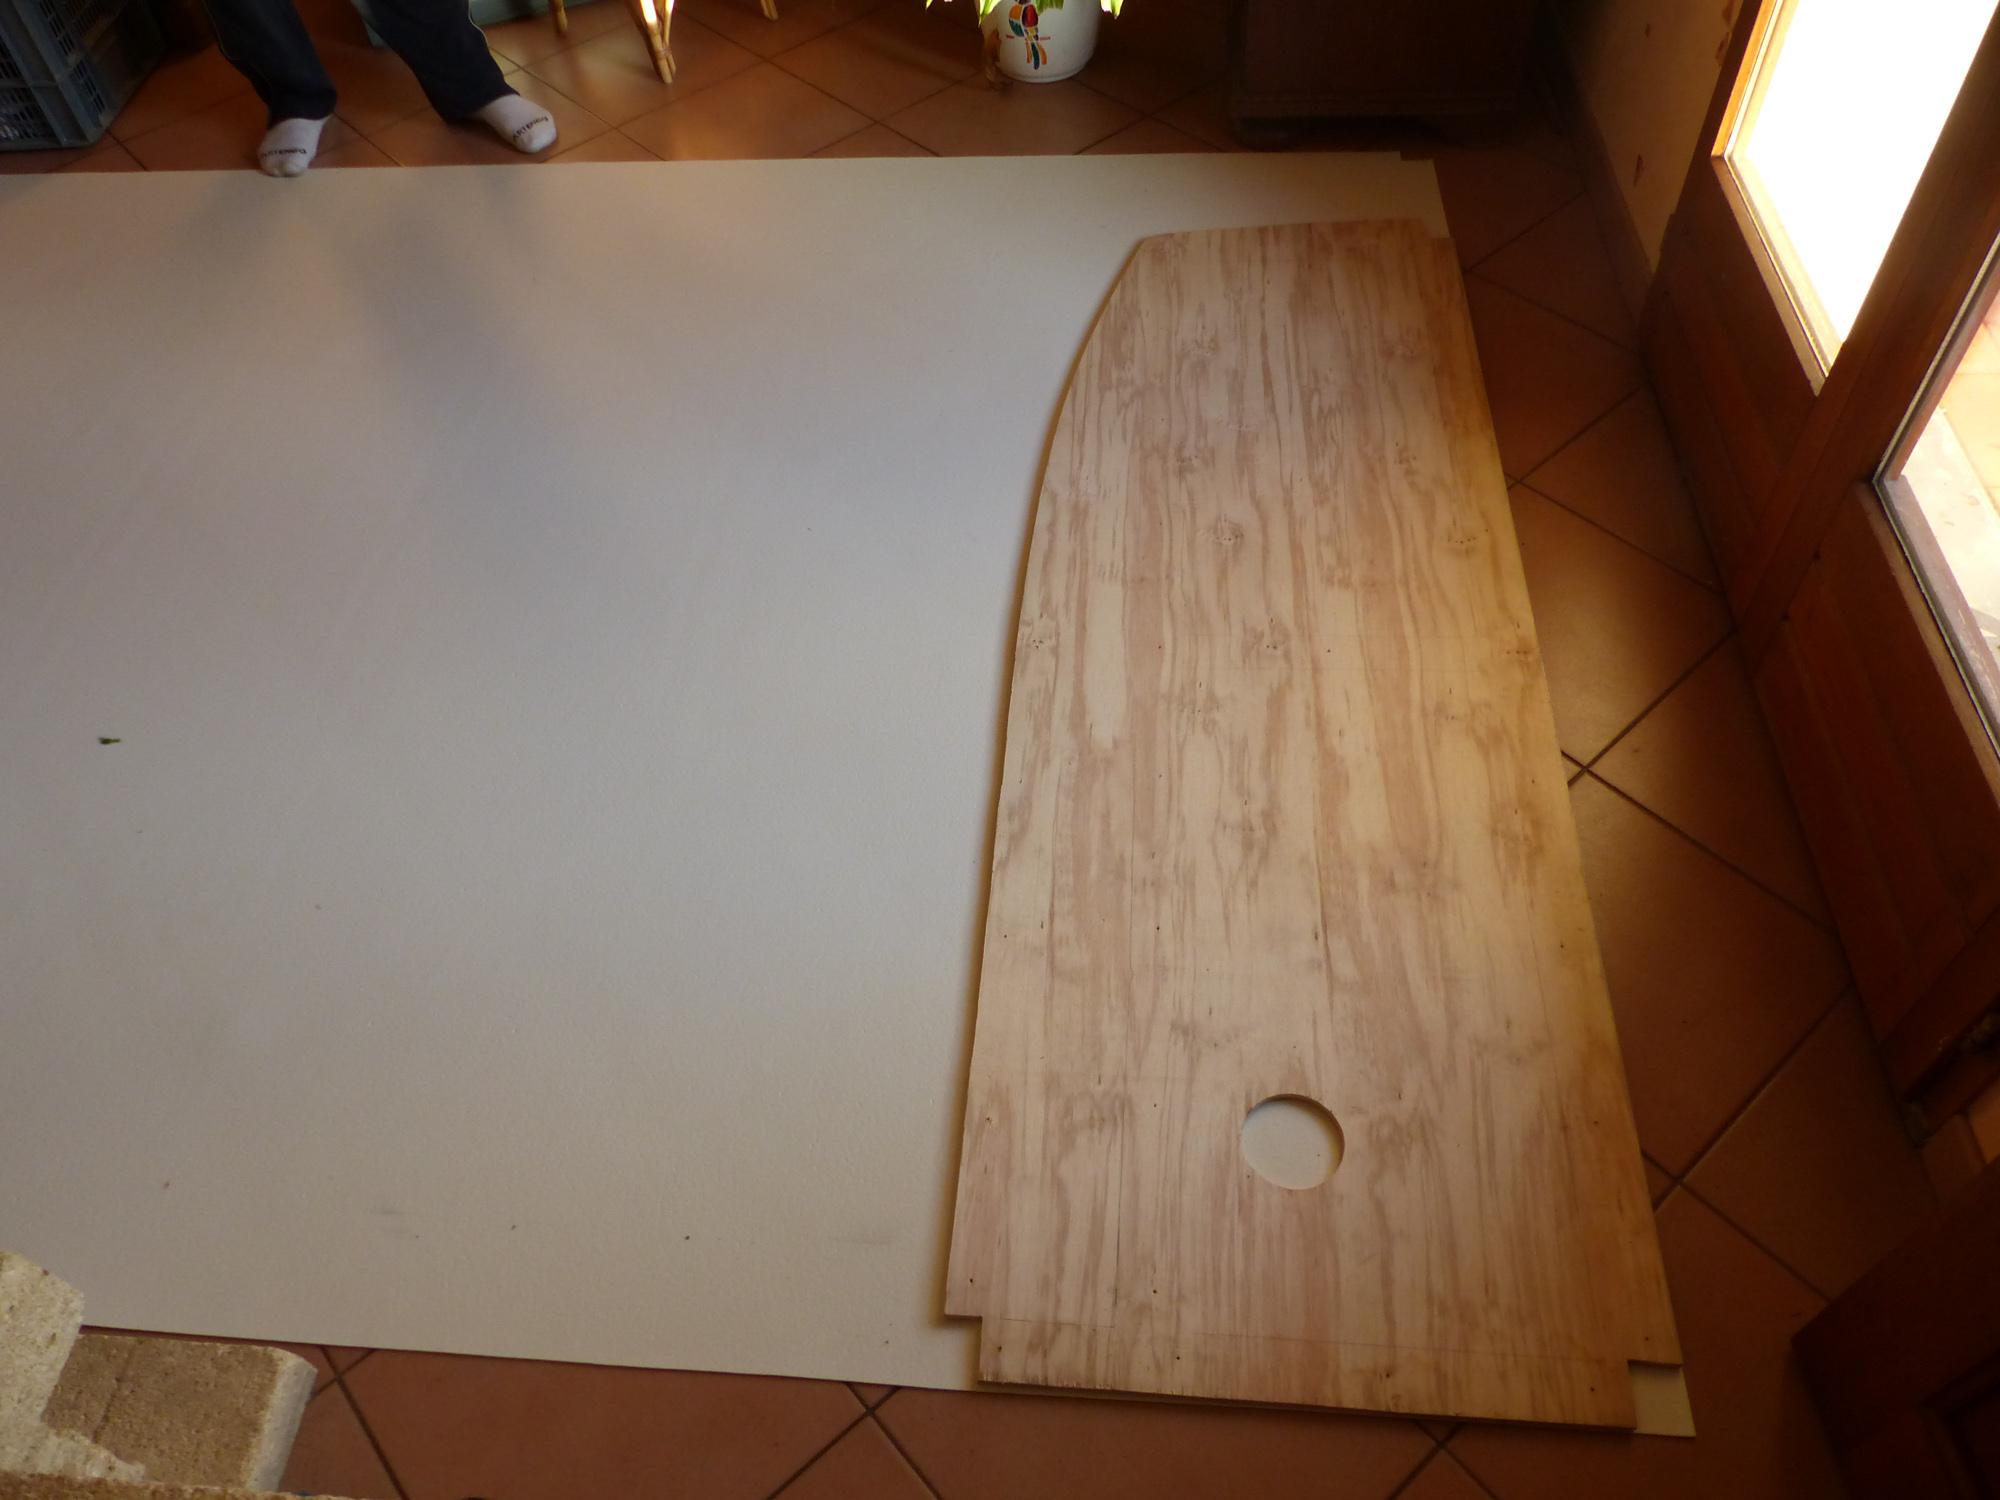 habillage de la douche du fourgon poimobile fourgon am nag. Black Bedroom Furniture Sets. Home Design Ideas